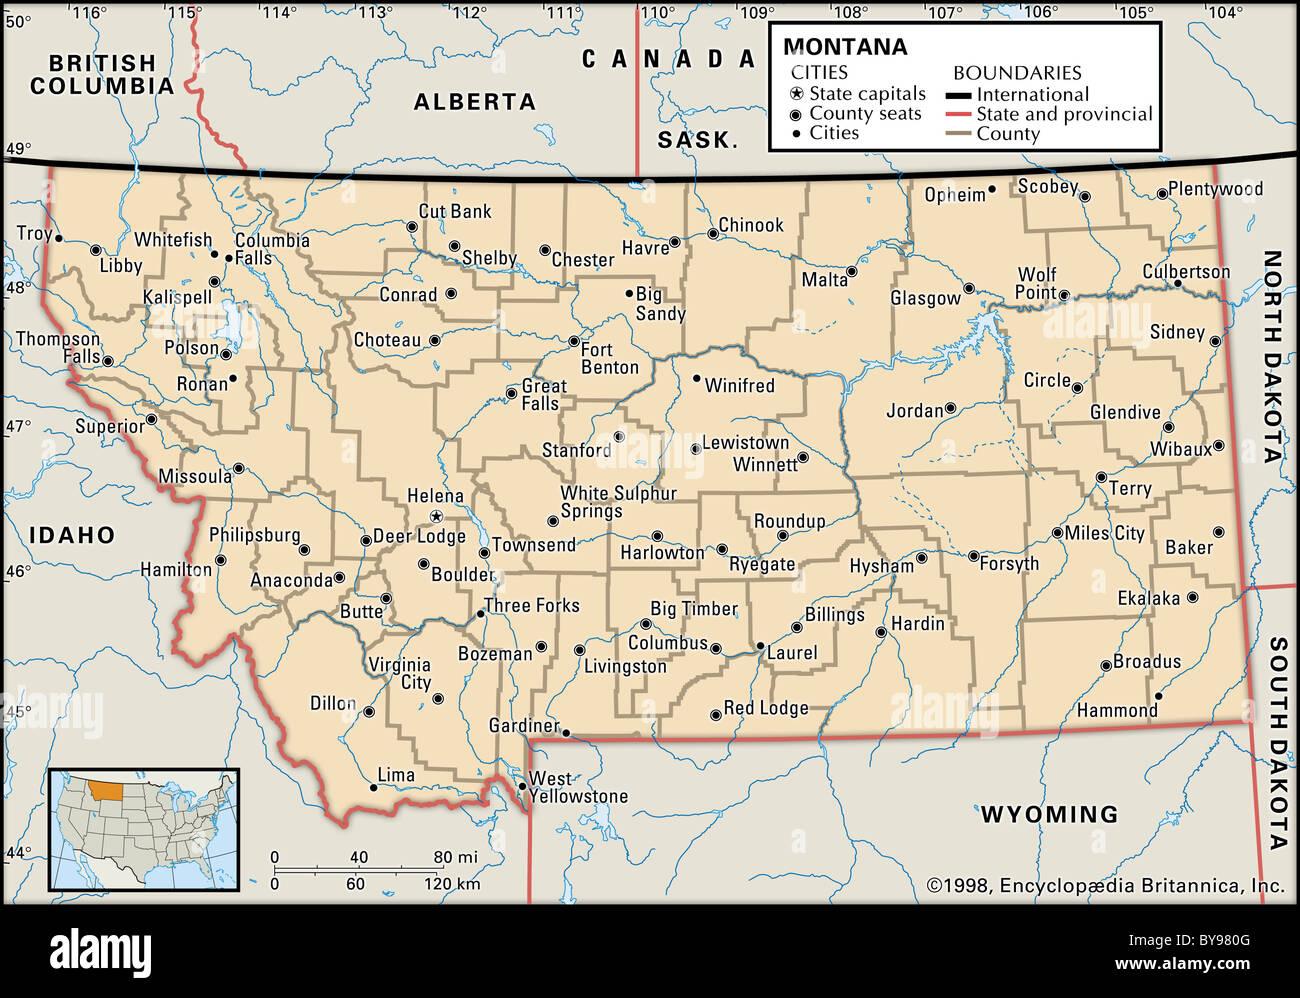 Montana Elevation Map